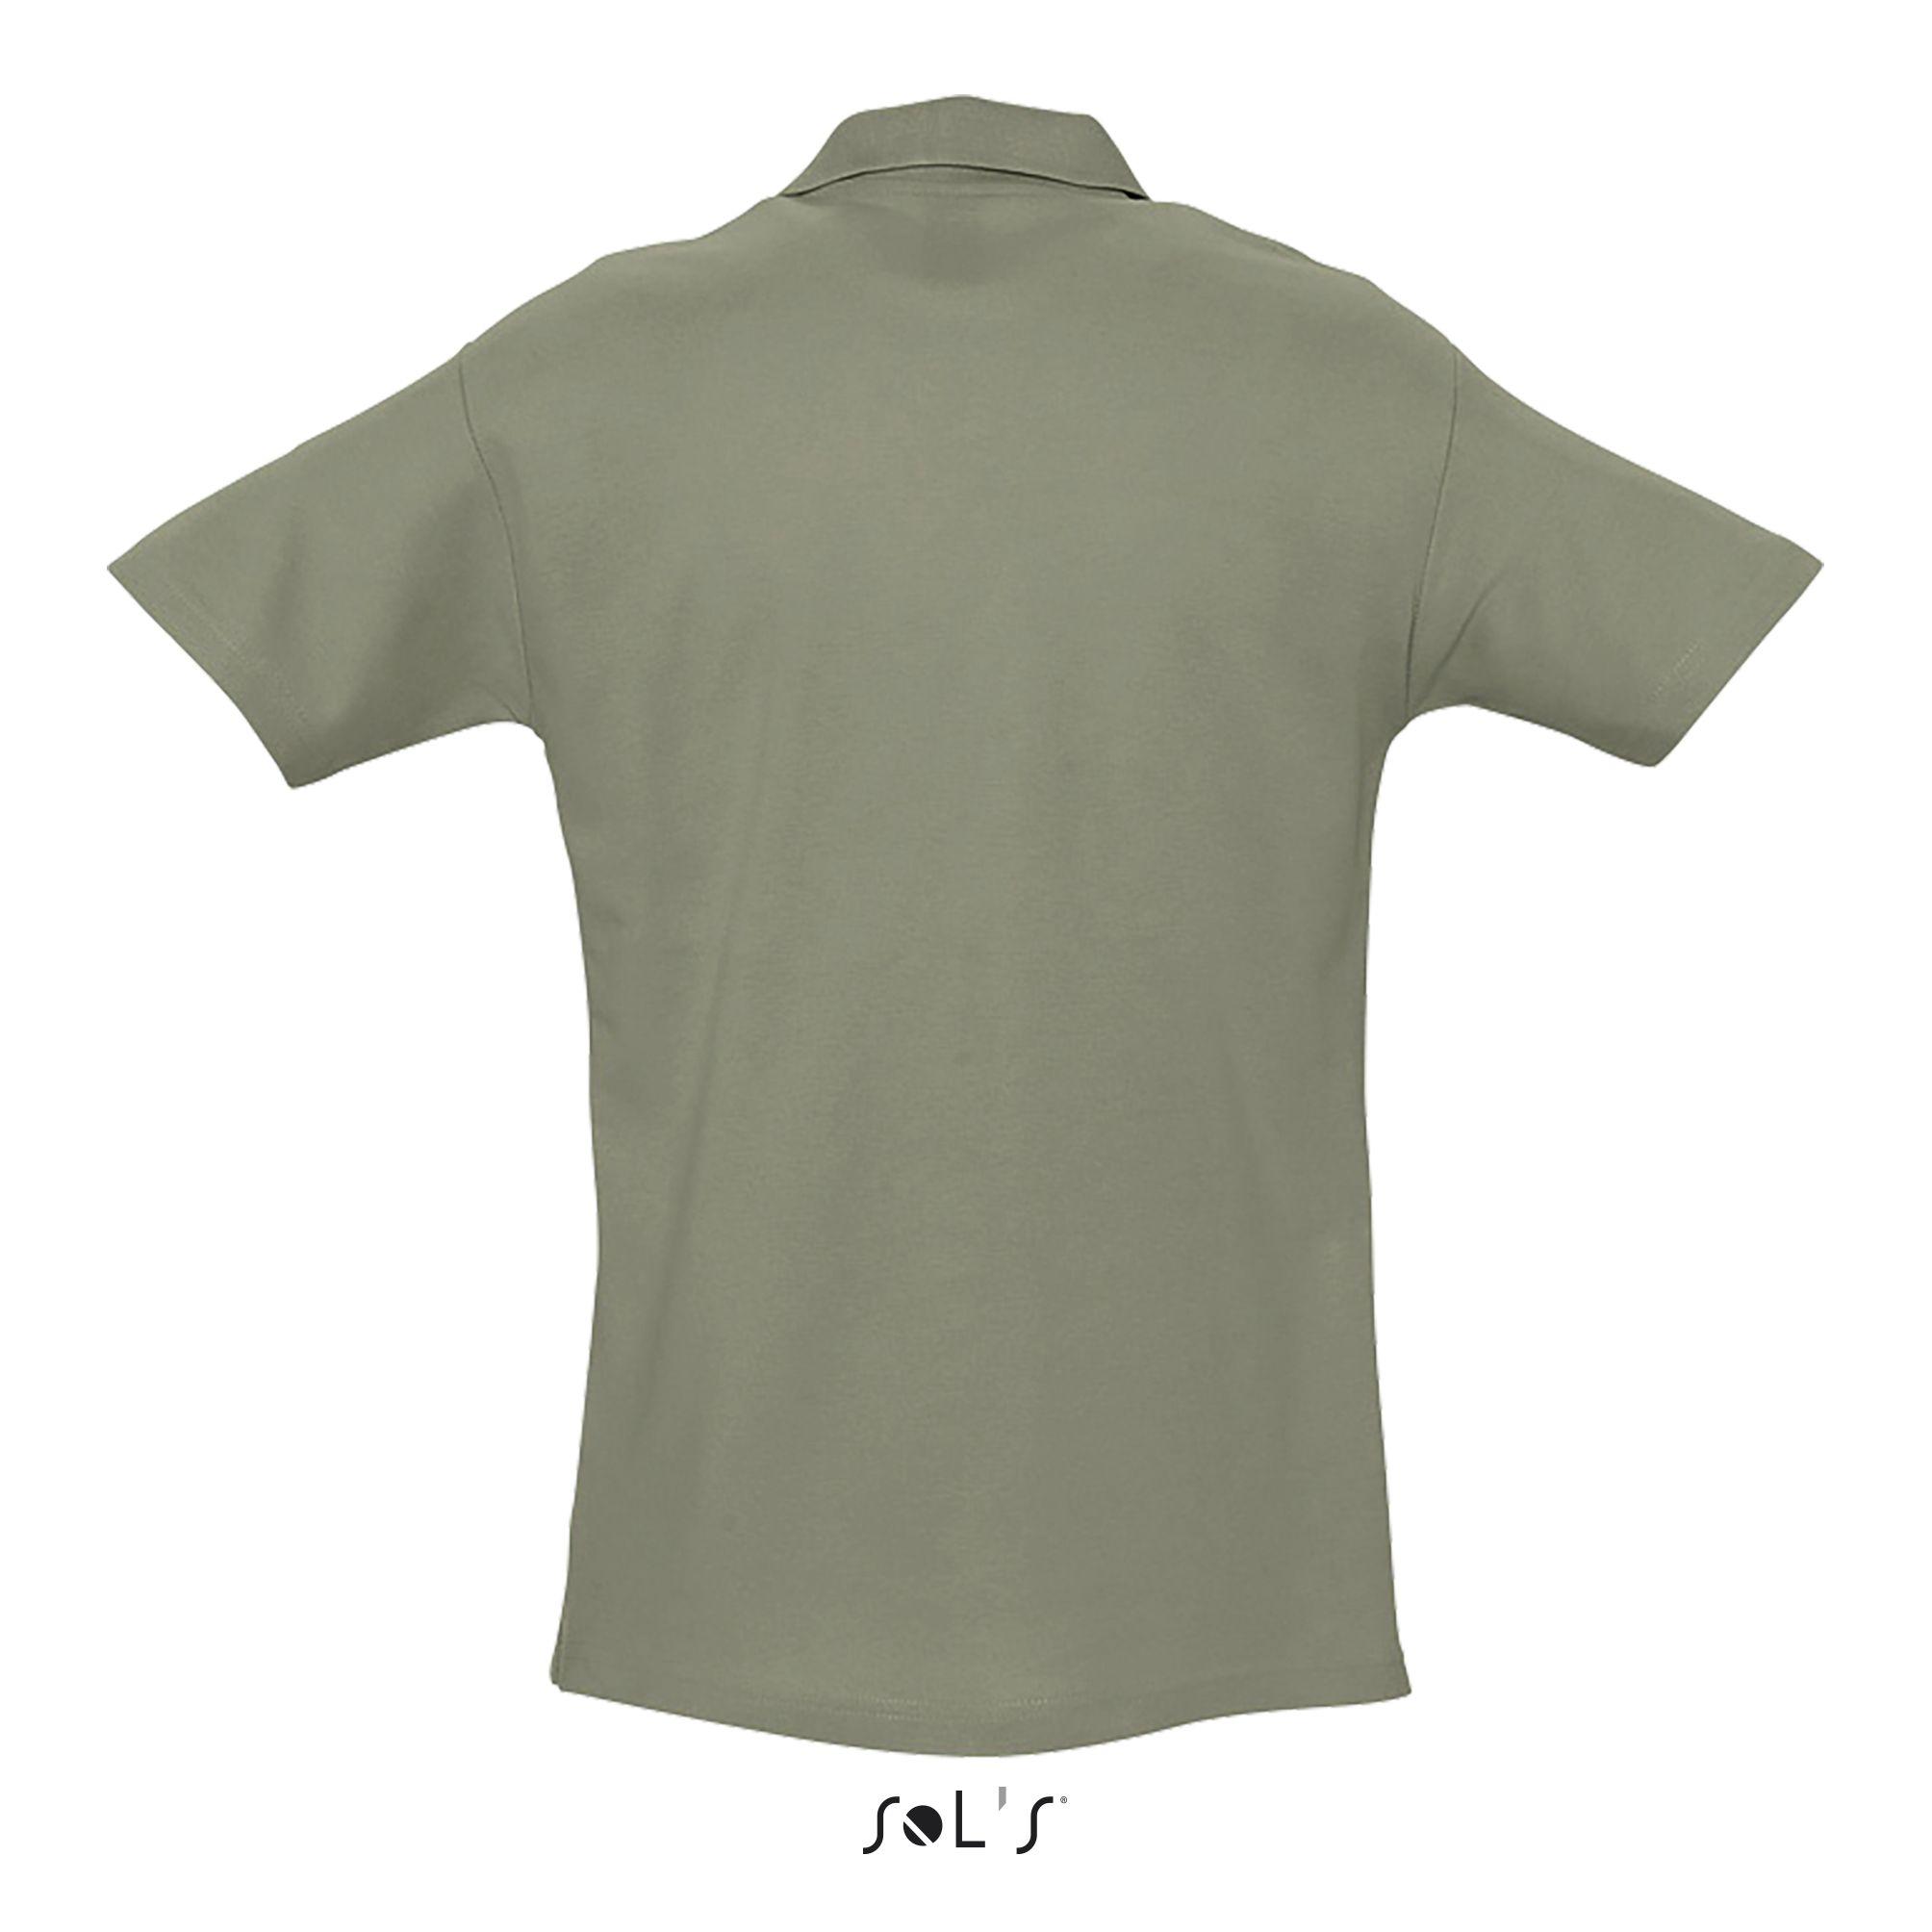 268 - Khaki